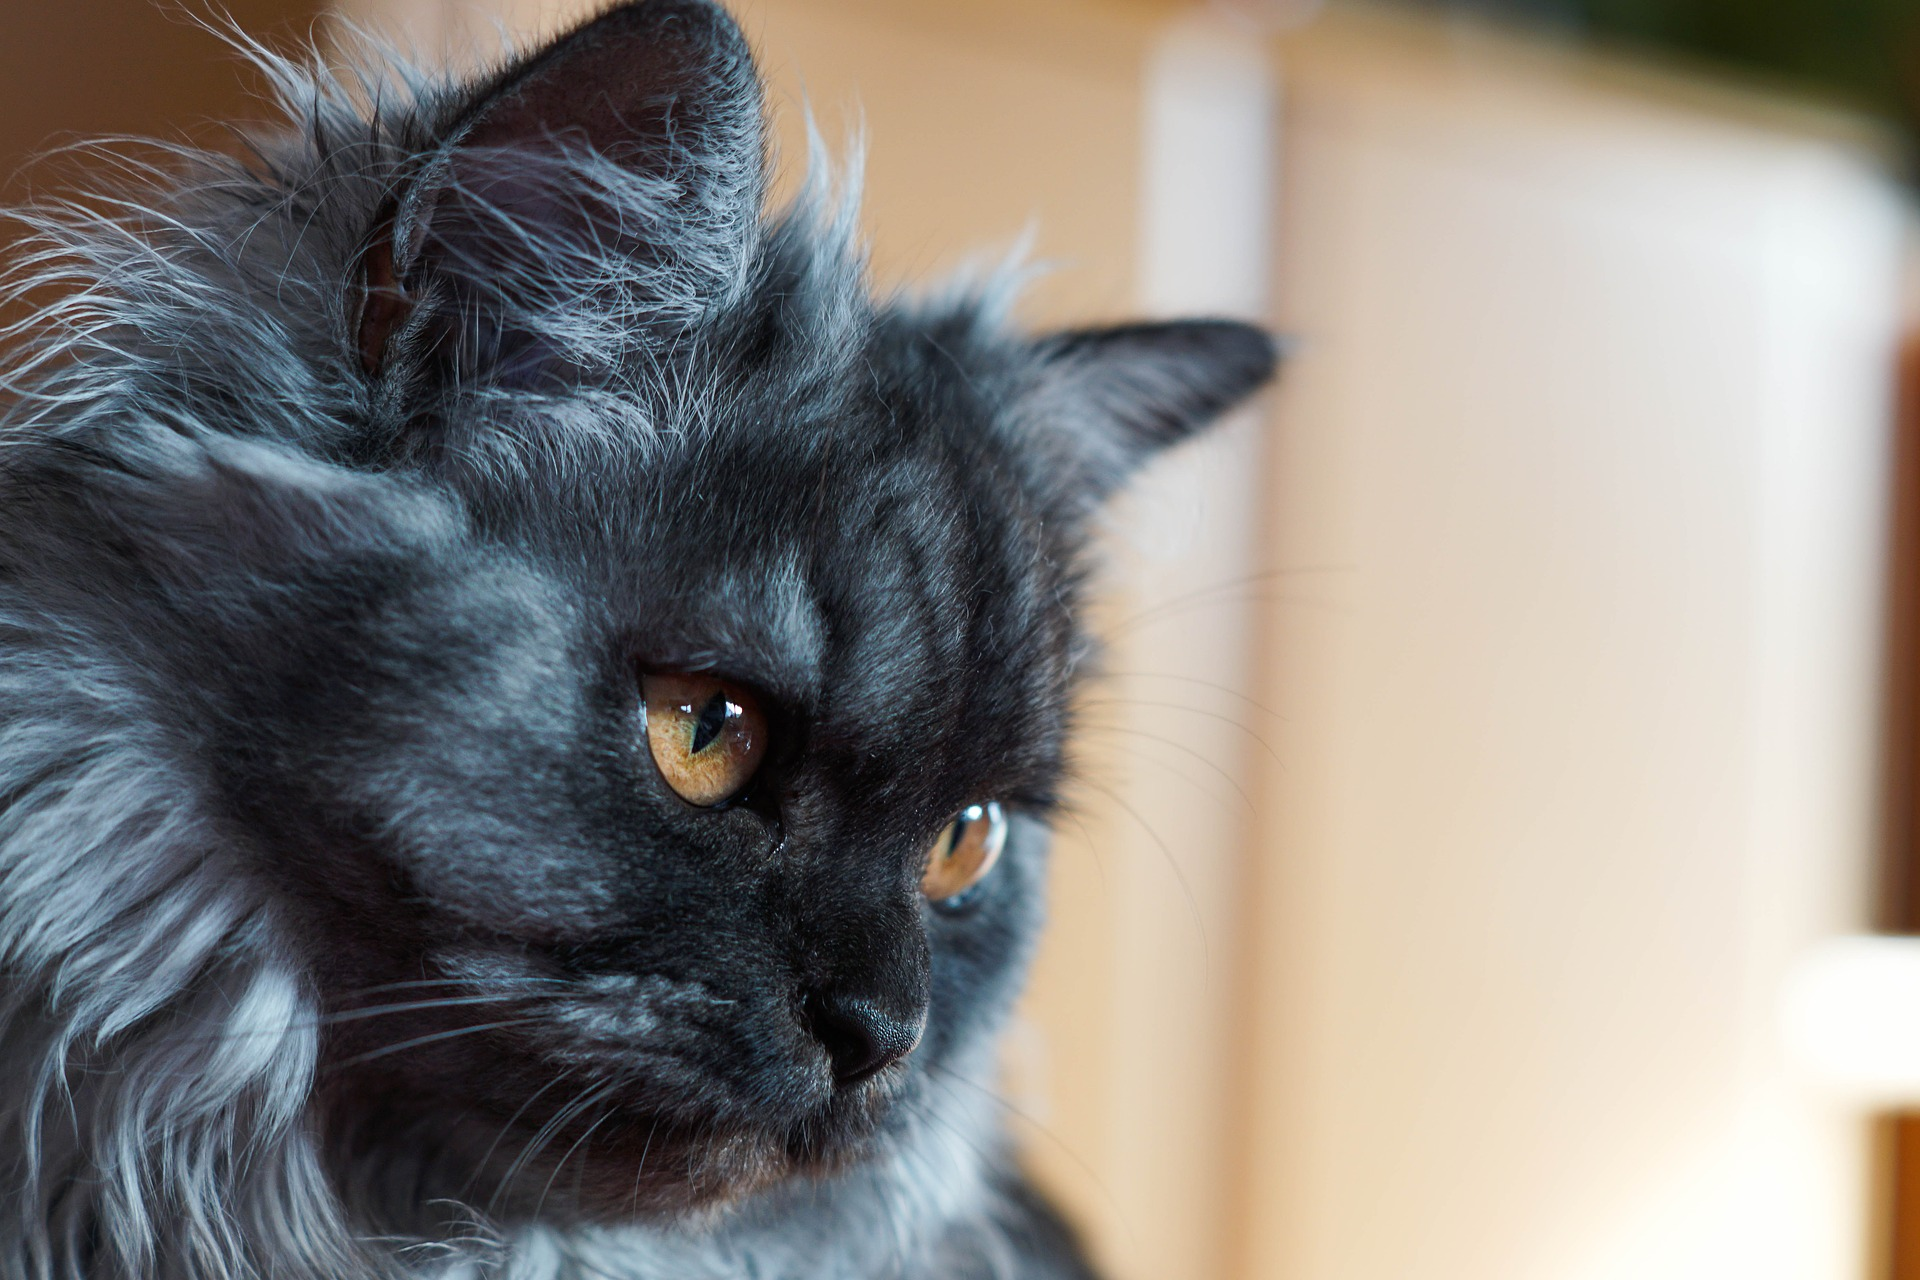 Help your older cat rest comfortably